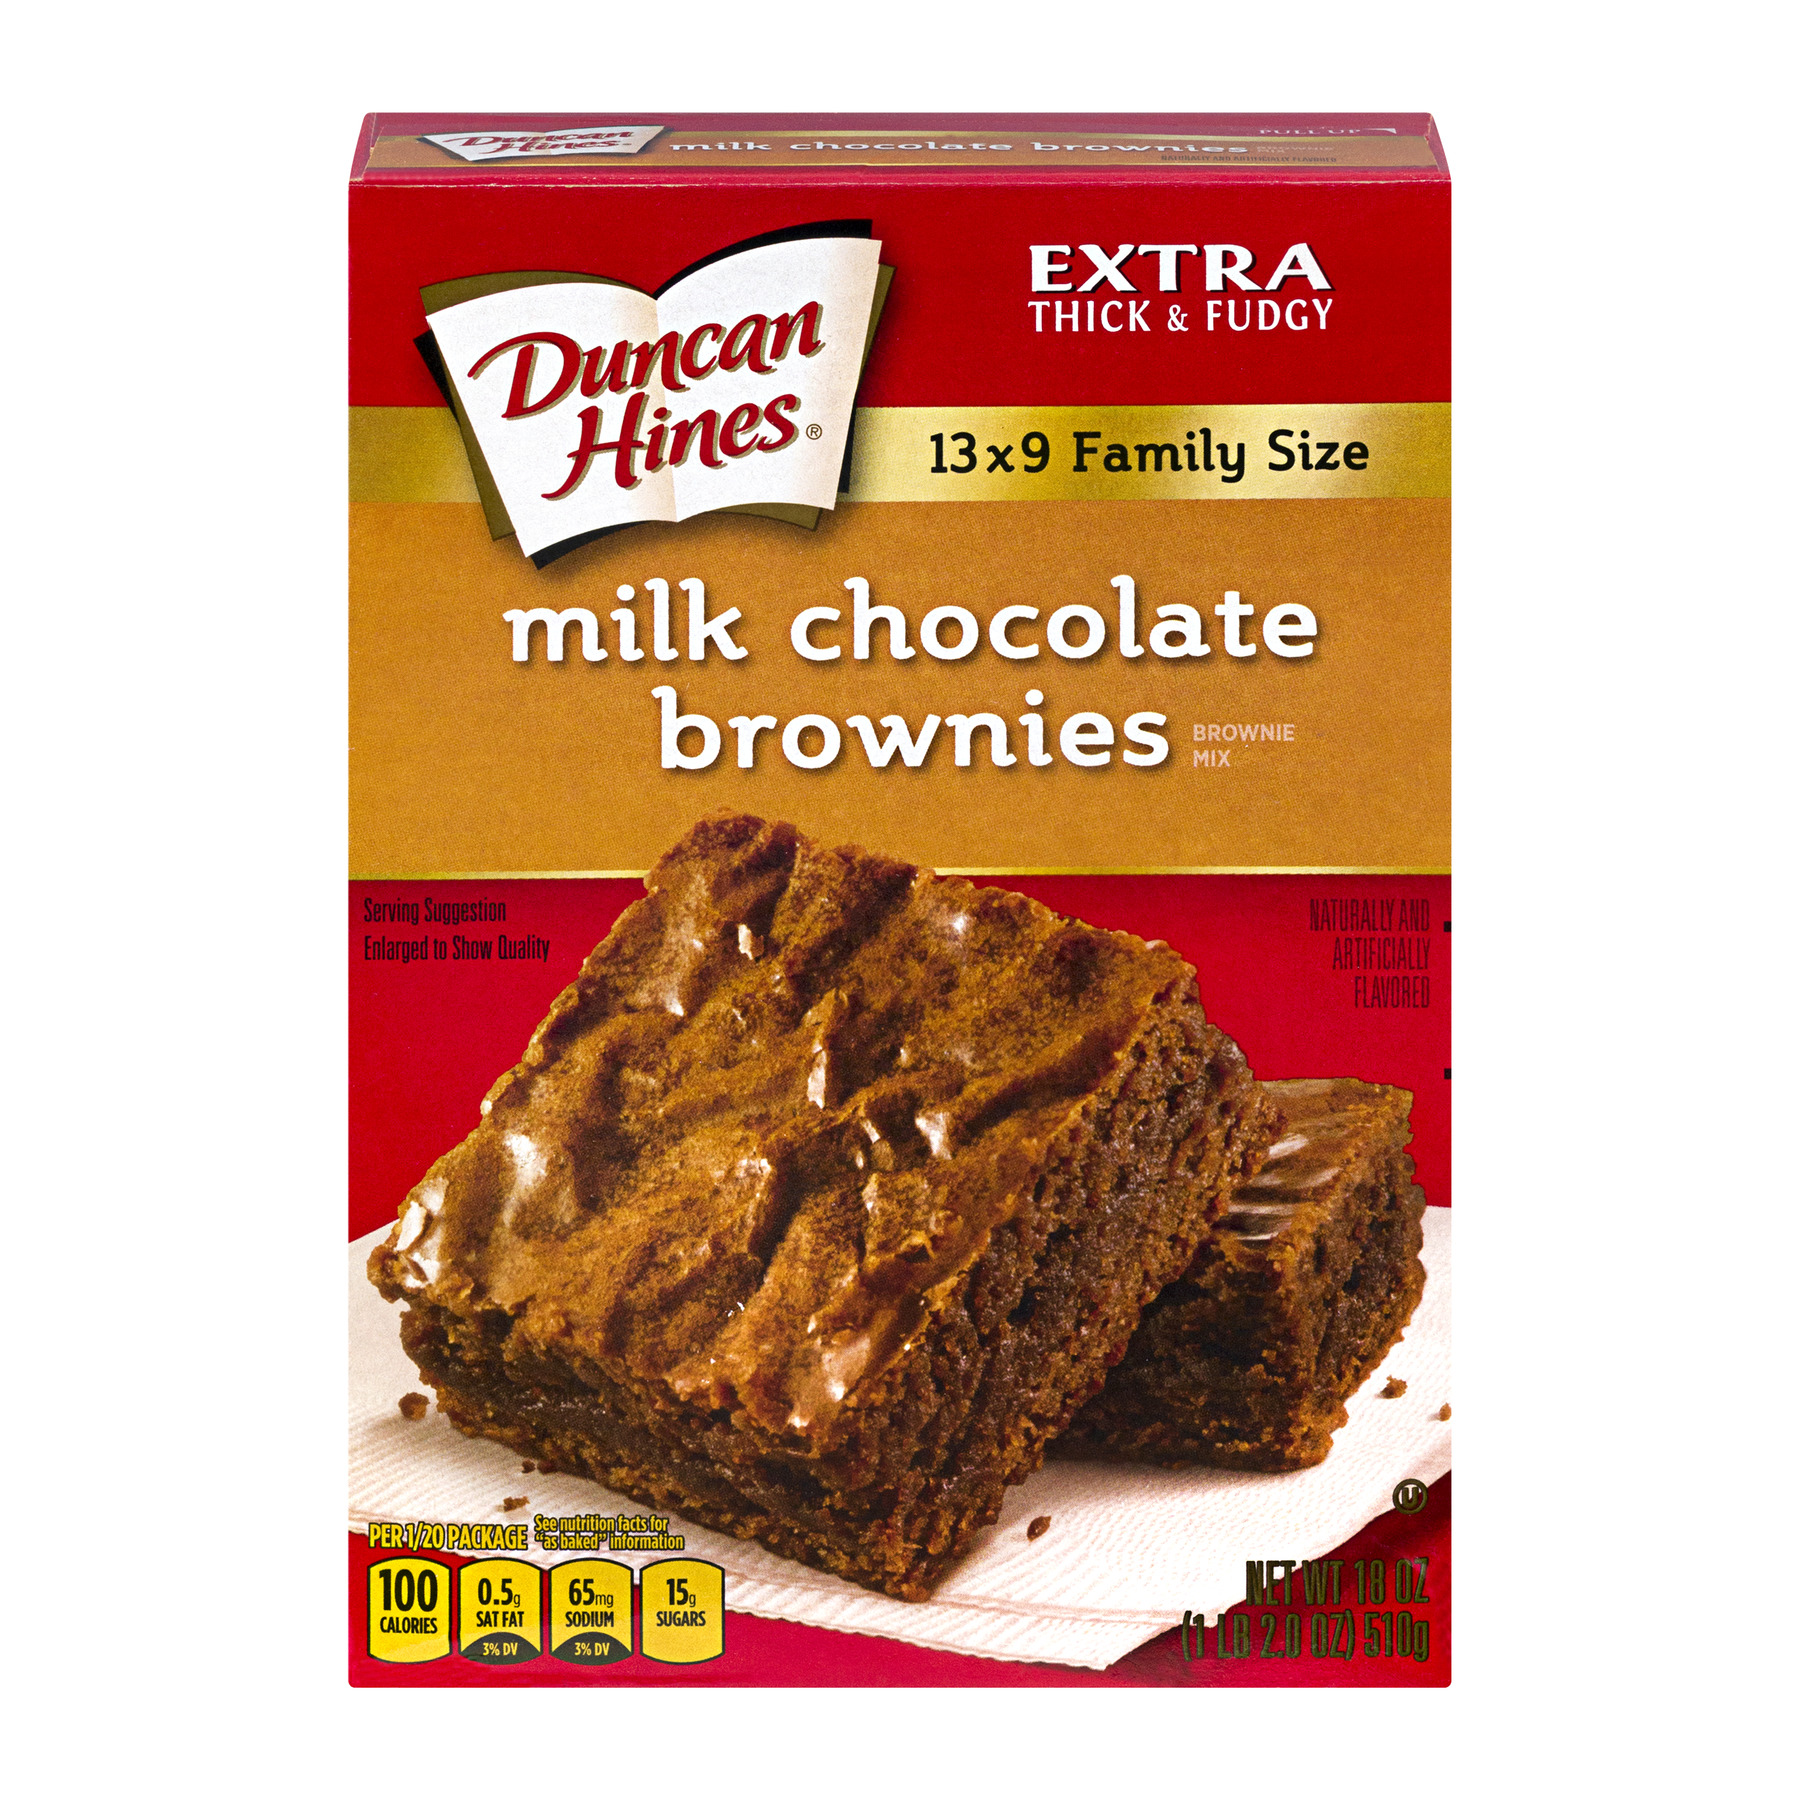 (5 Pack) Duncan Hines Milk Chocolate Brownie Dessert Mix, 18 oz Box